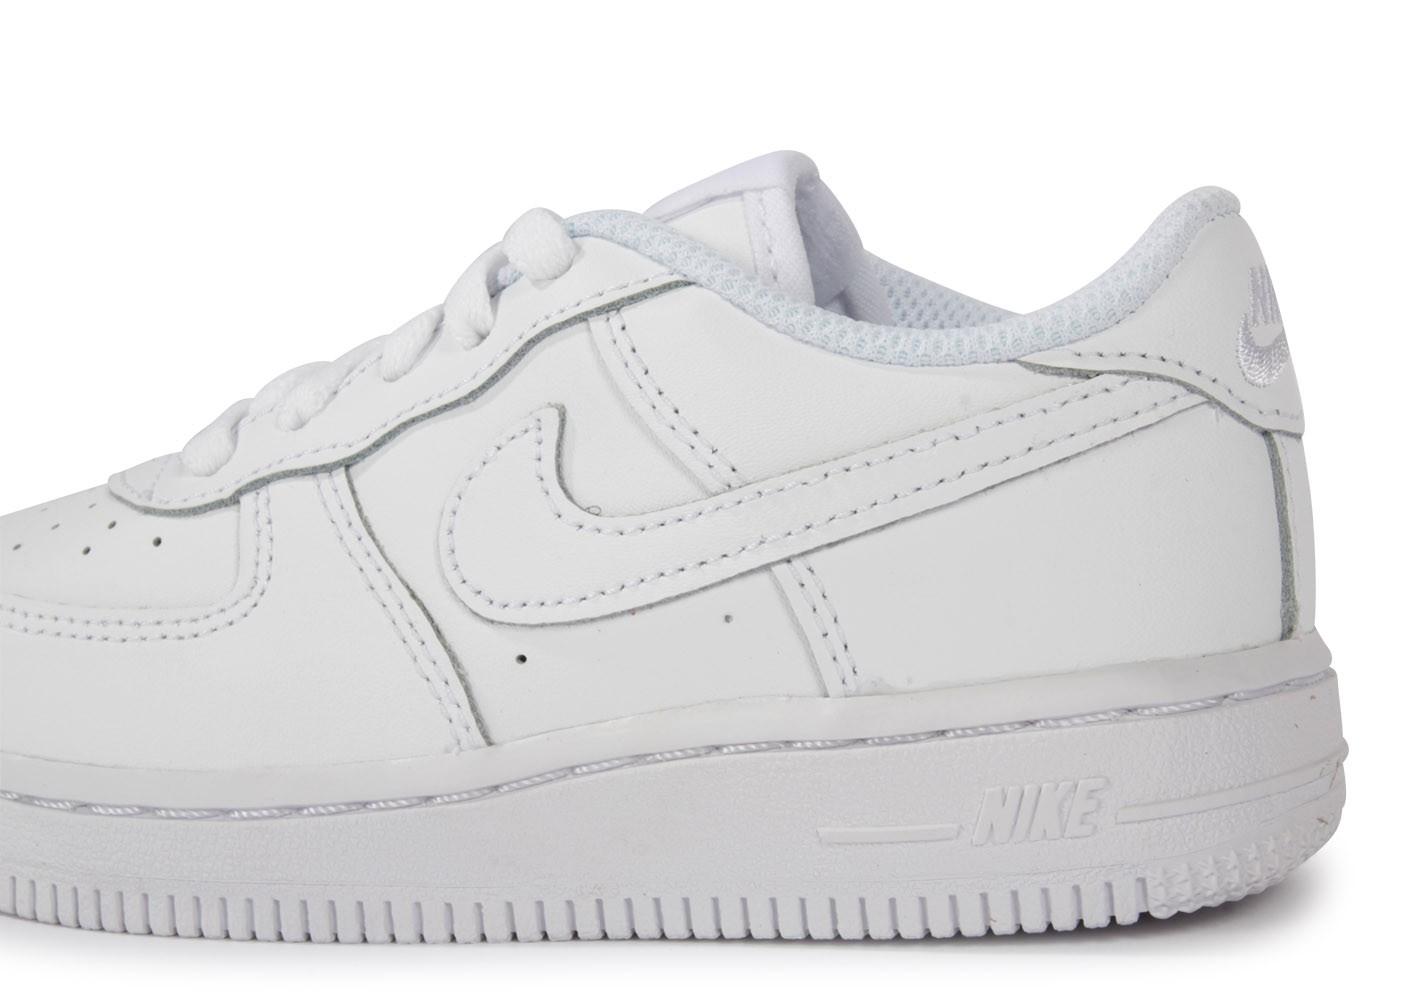 60967a56fab Nike Tws5xuqp Vs Adidas Chaussure Easy Zalando Chaussures HpzAqCx ...